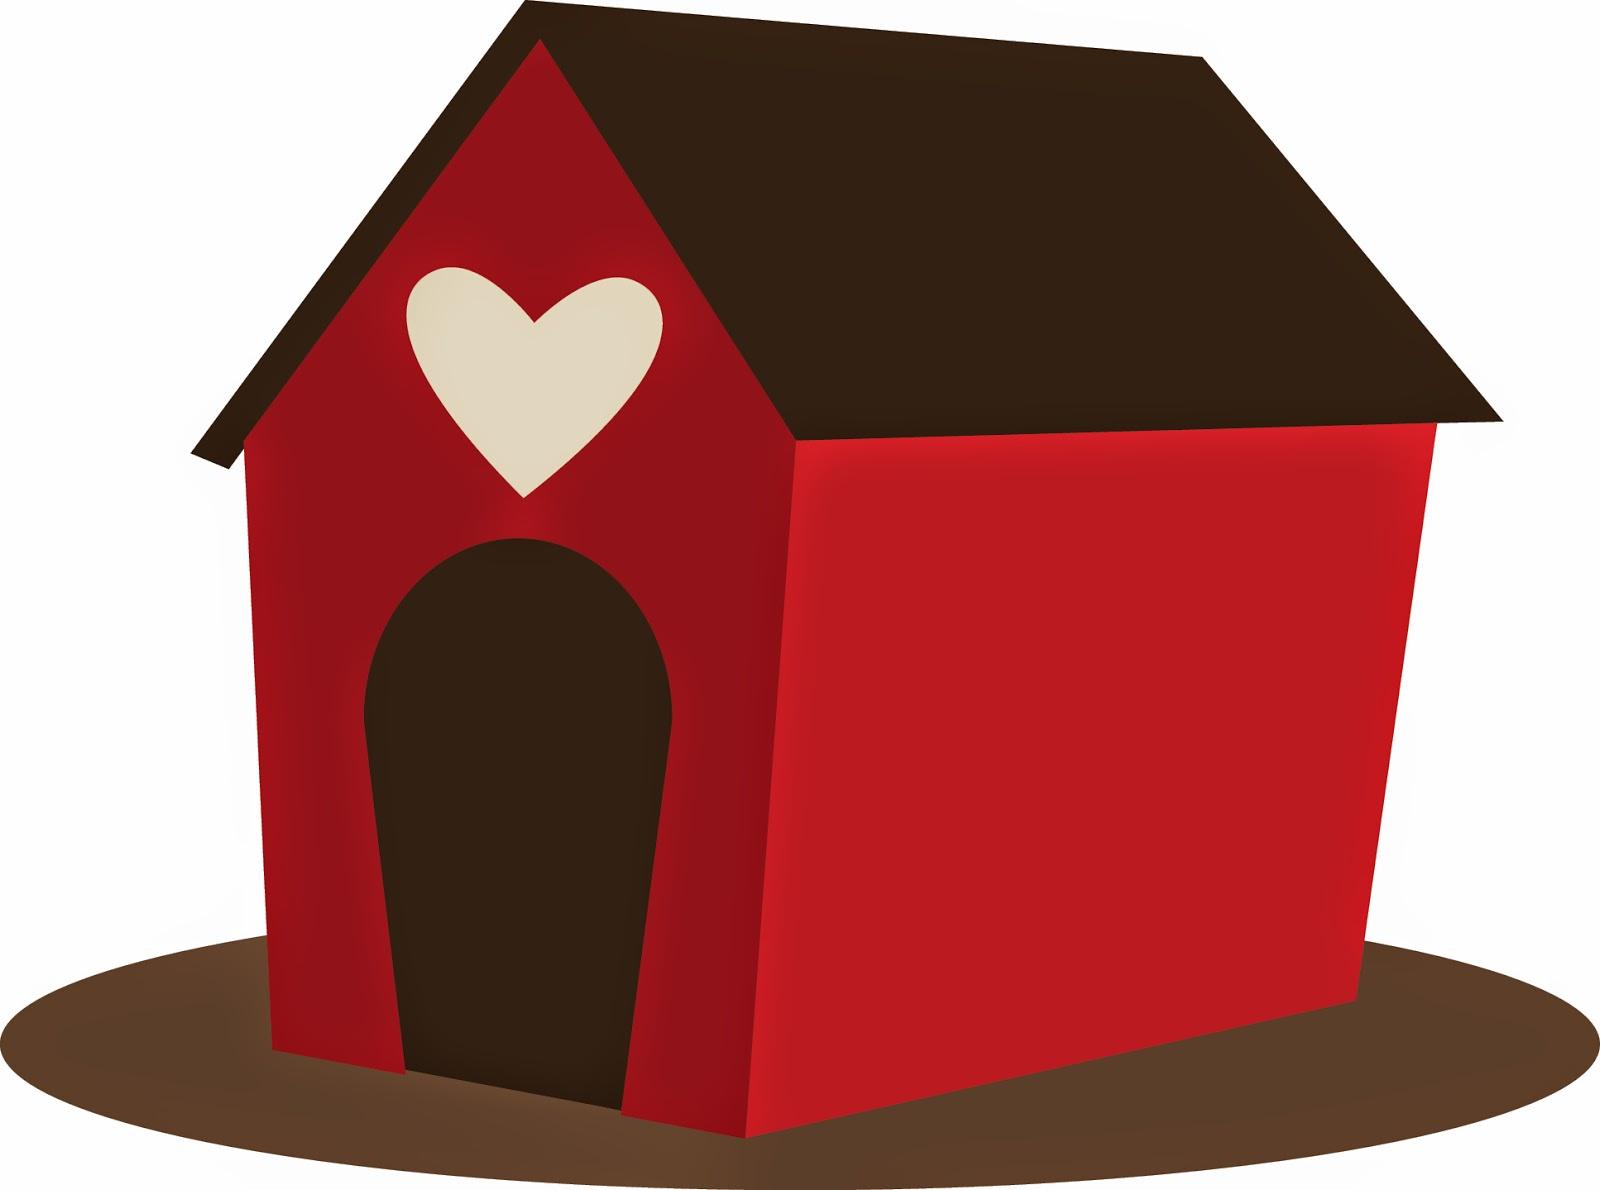 White Heart Dog House Clipart-White Heart Dog House Clipart-19